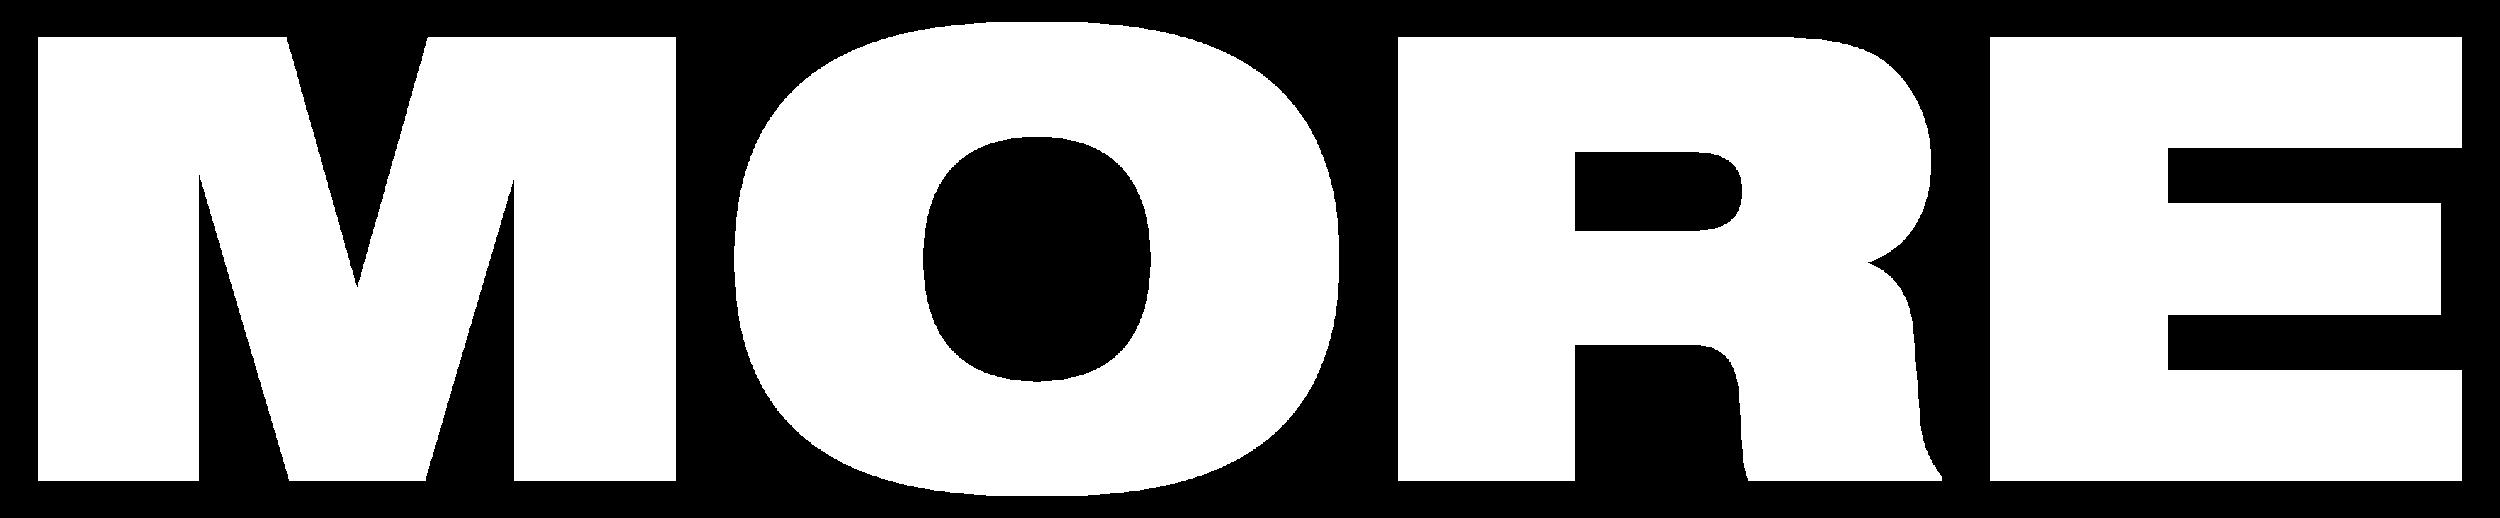 MORE_logo-07.png